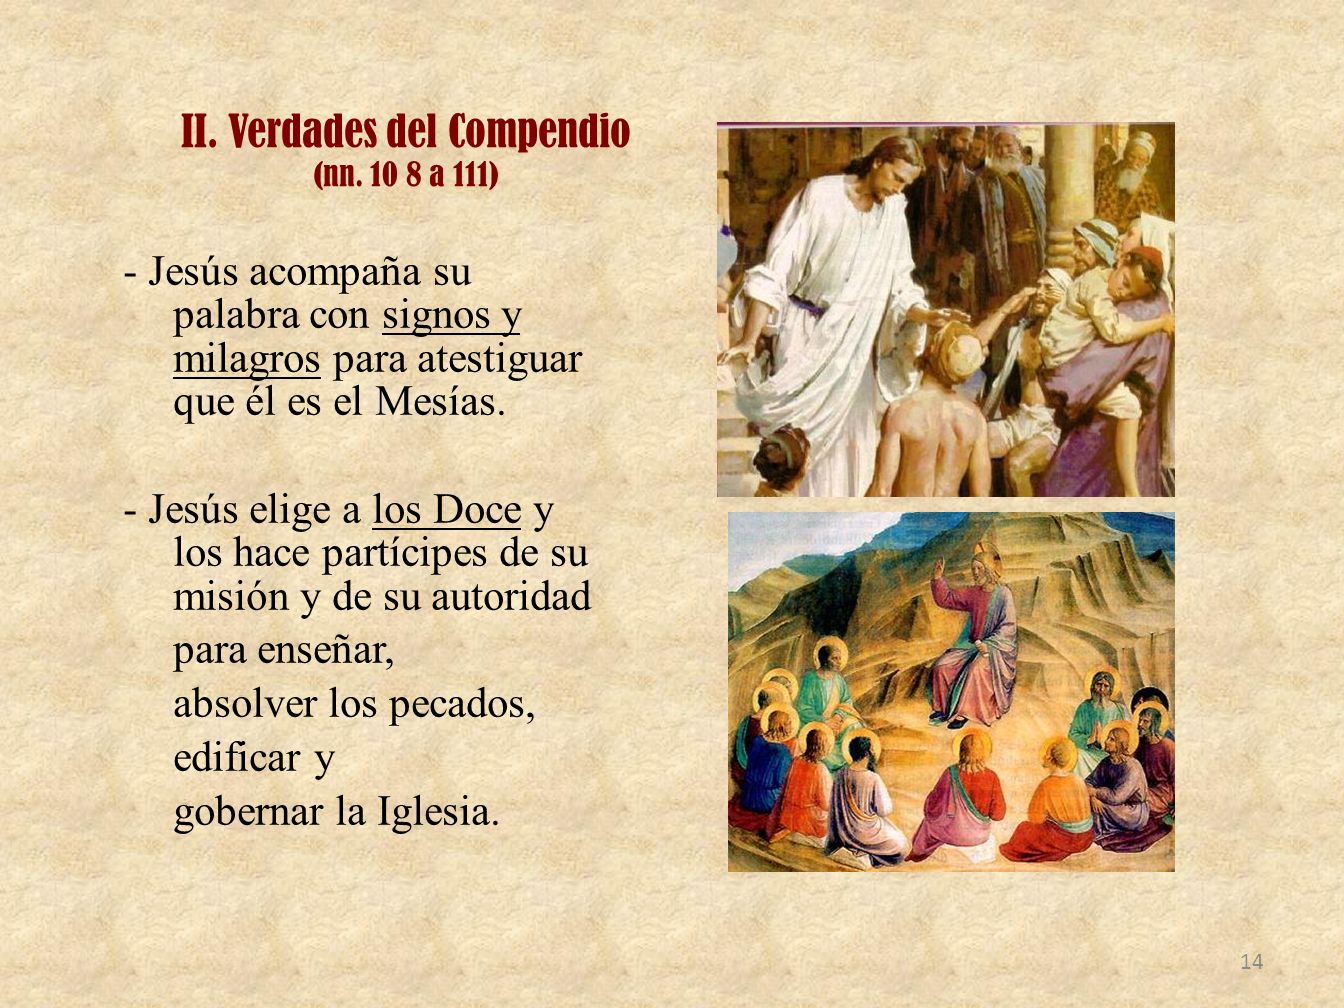 II. Verdades del Compendio (nn. 10 8 a 111)